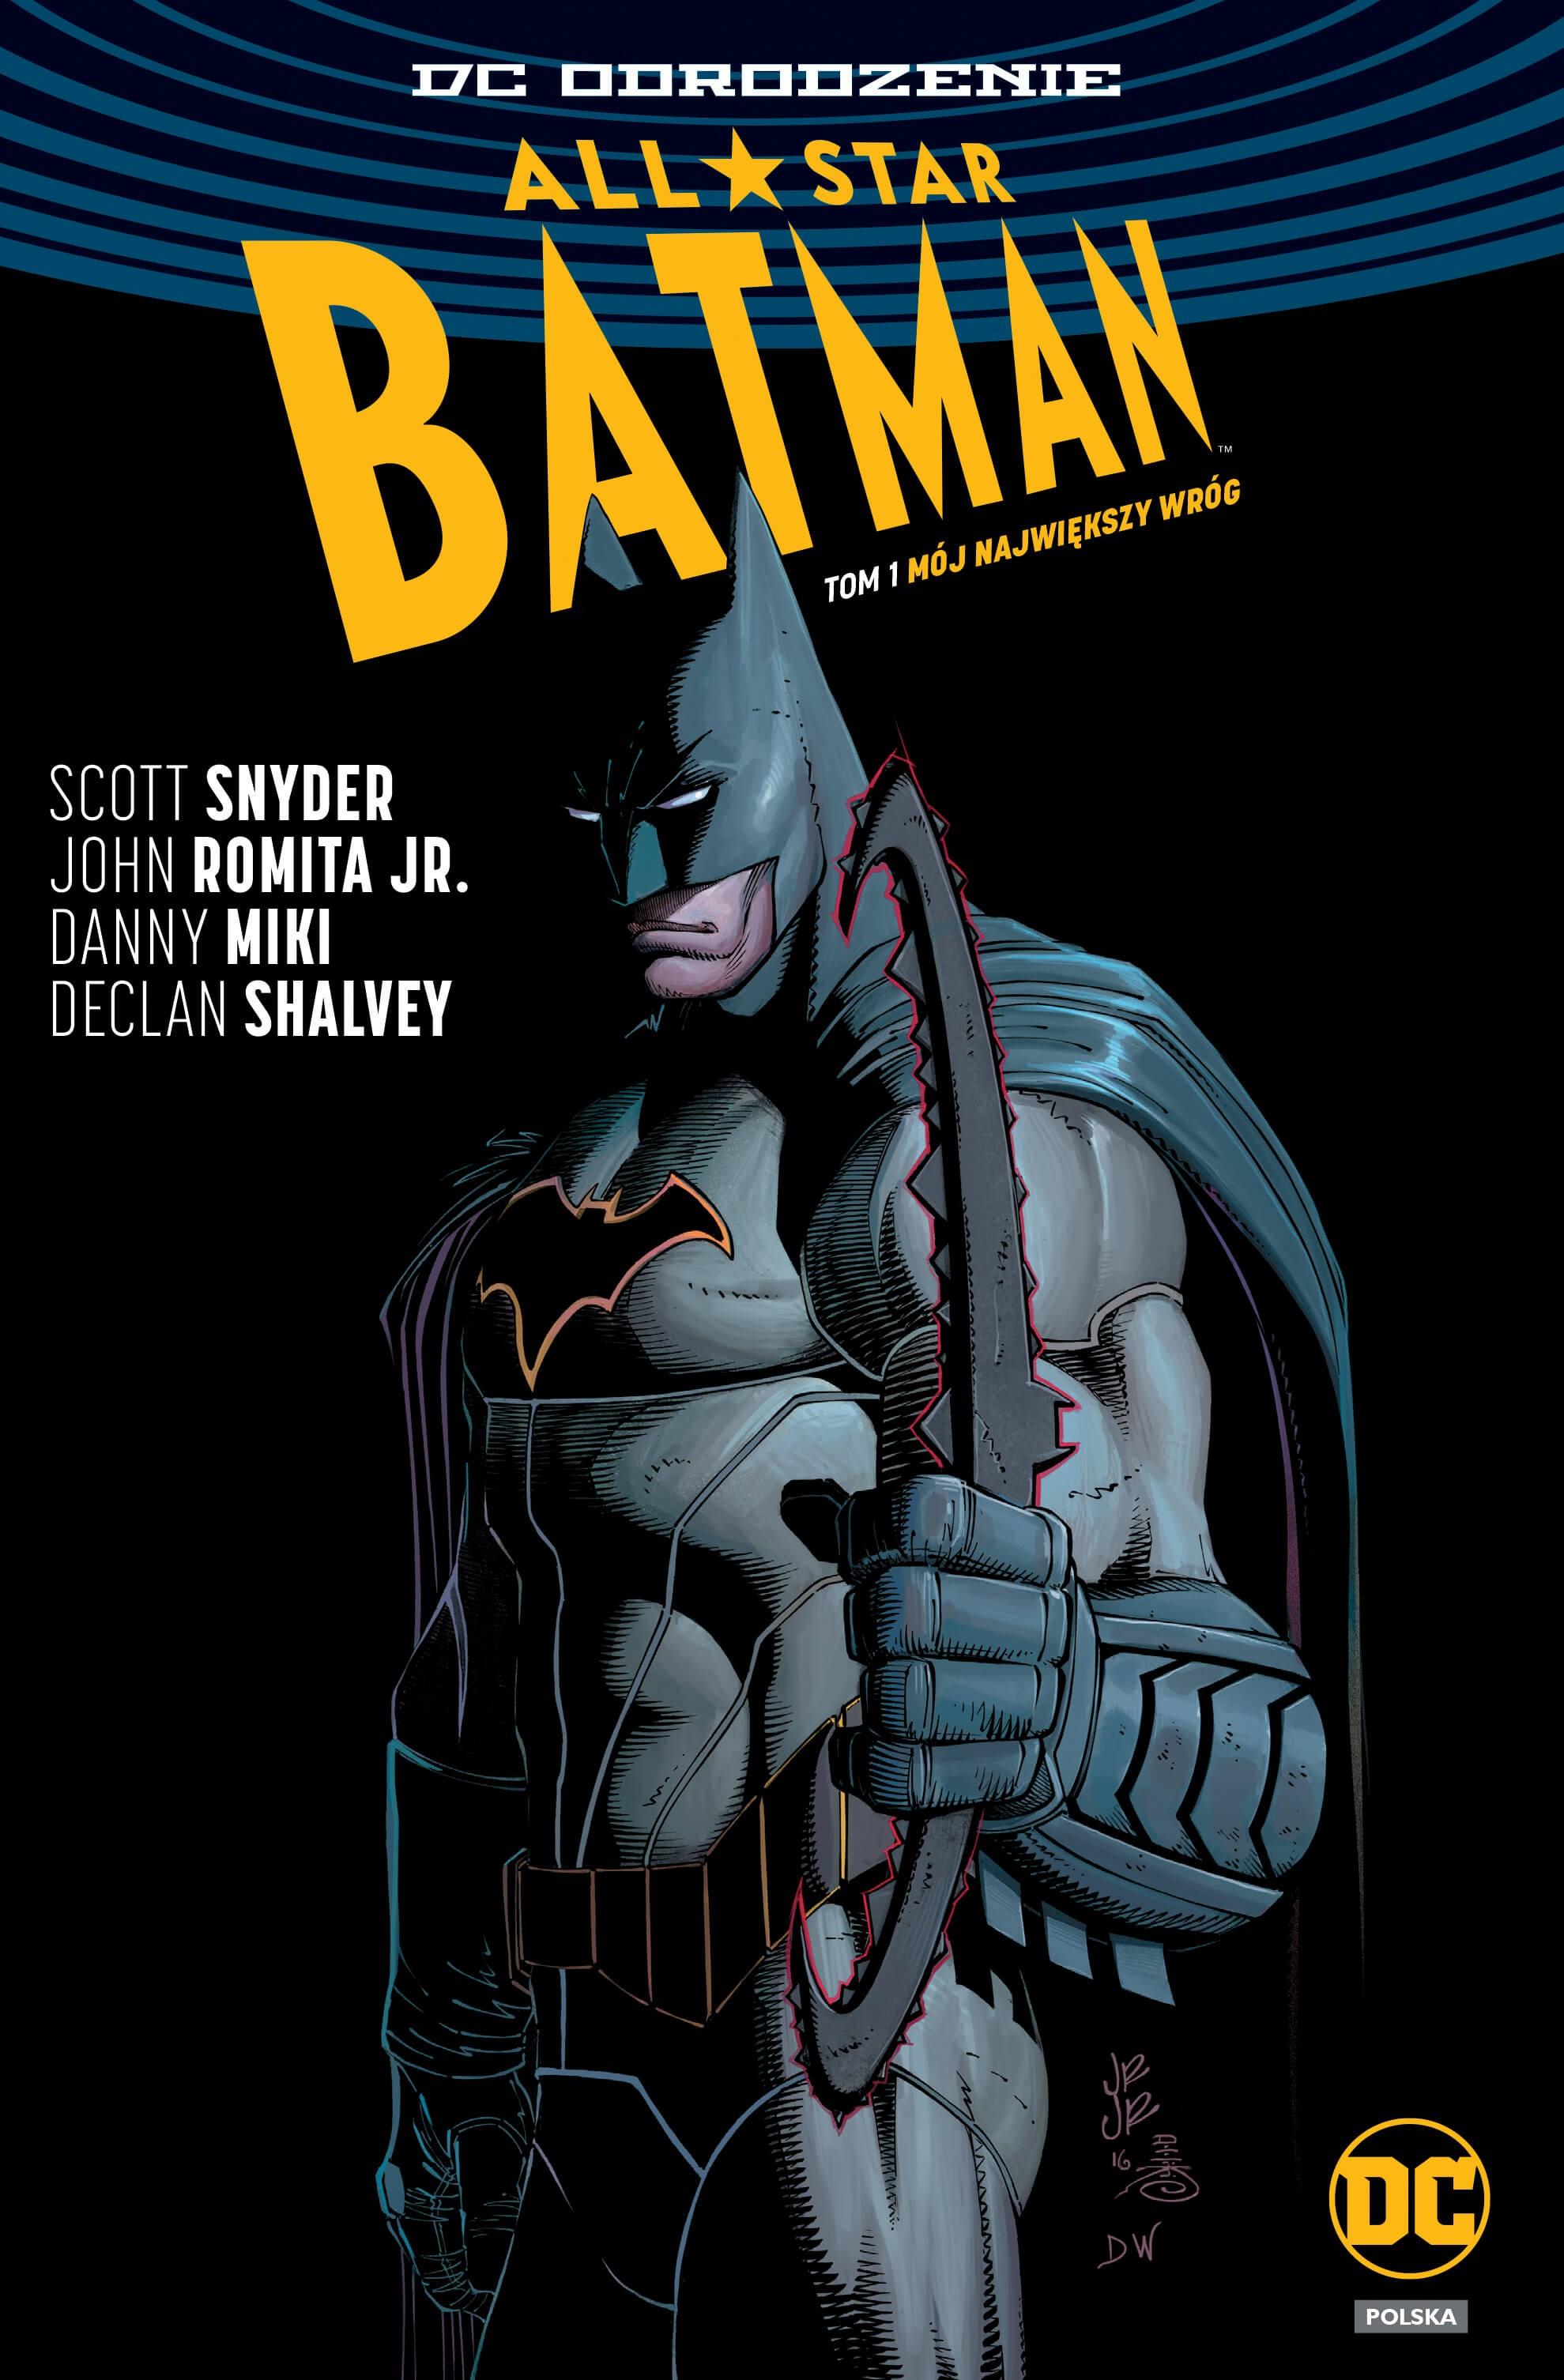 cover_rebirth All Star Batman_tom 01 300 dpi.jpg